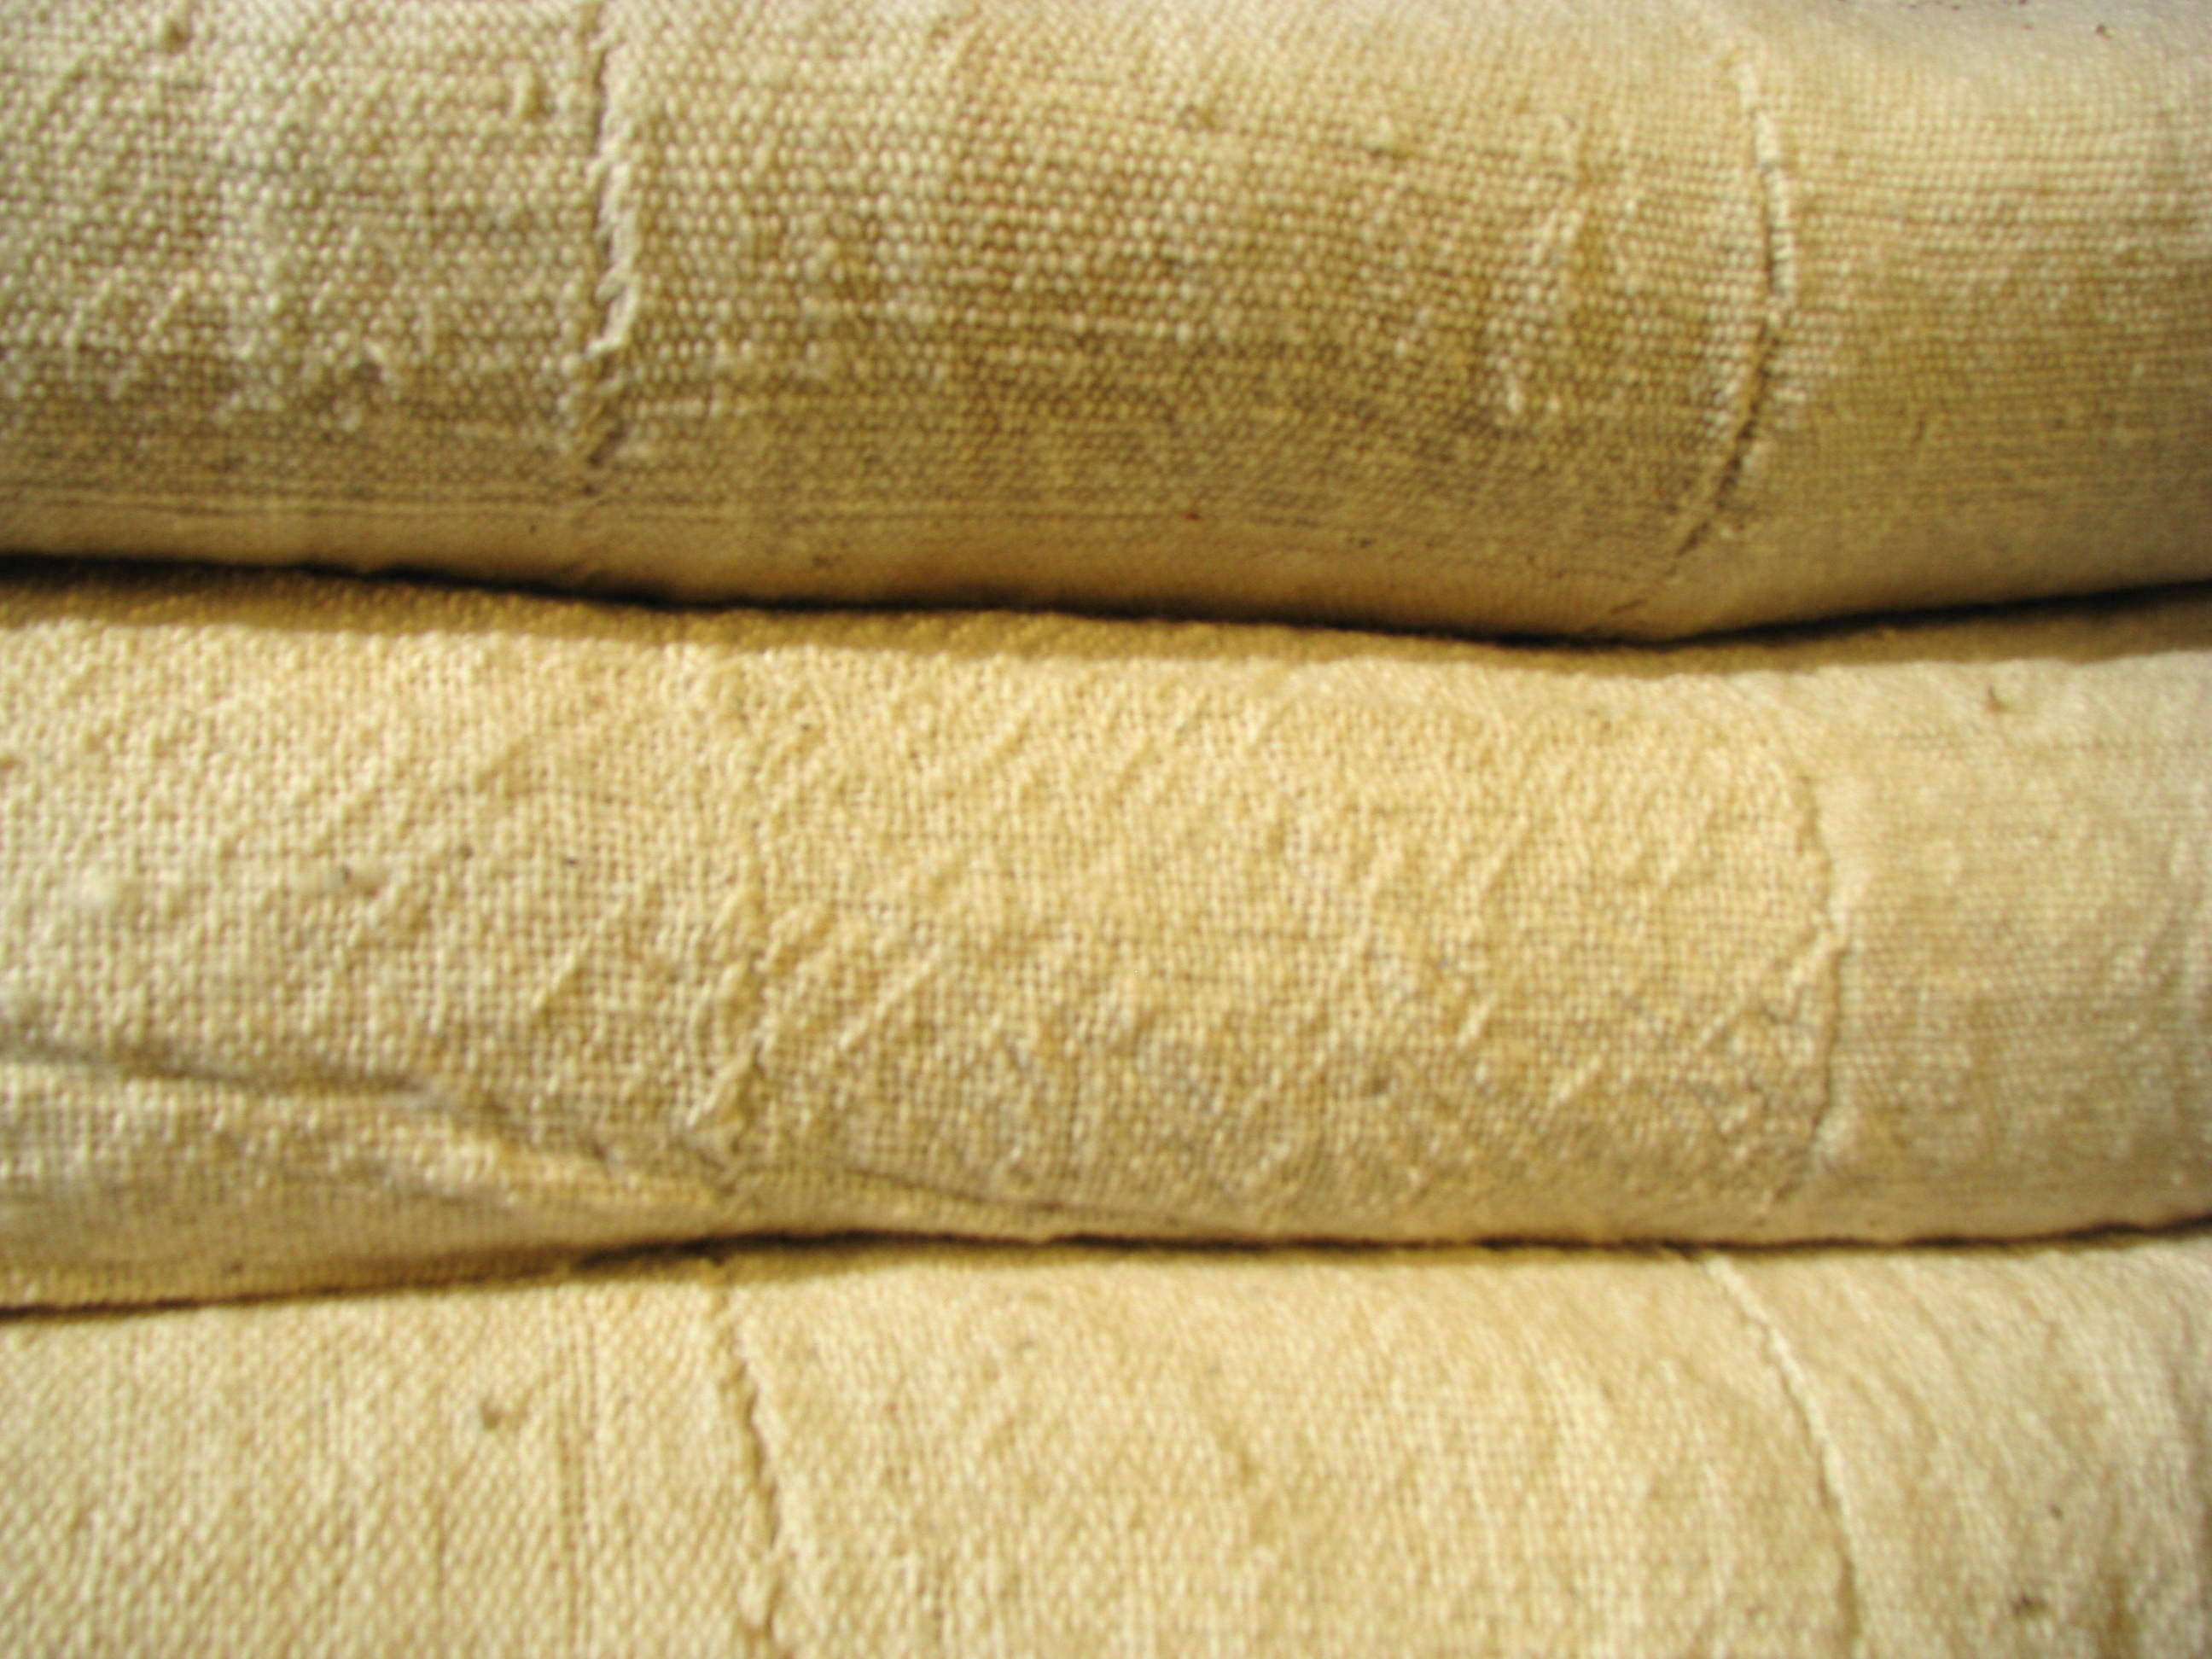 nice cotton plaid - bed cover - handmade - Burkina Faso